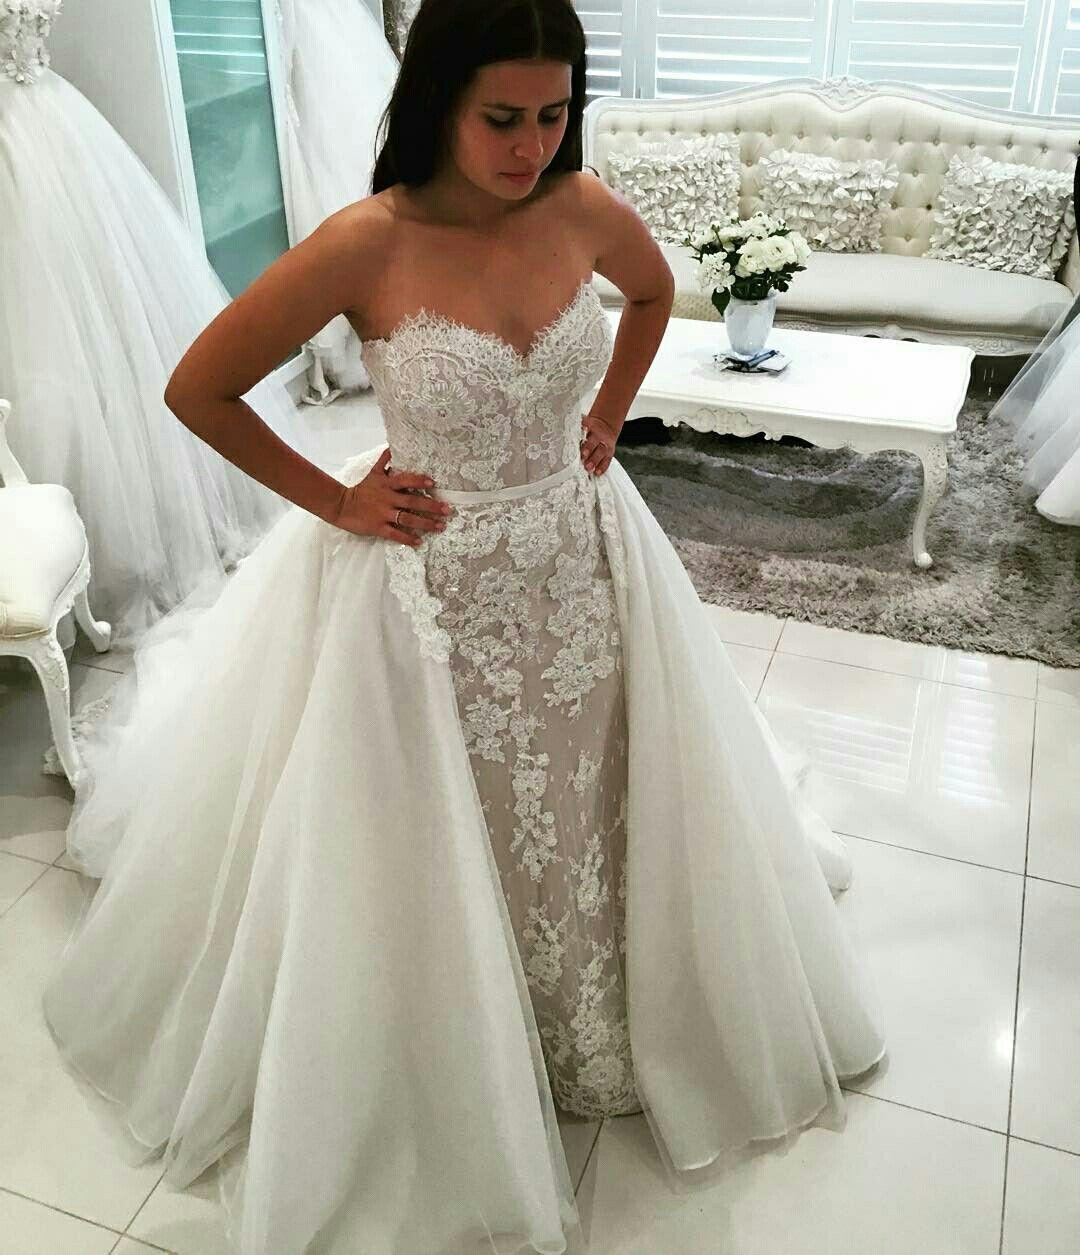 Pin by Alexandra on Wedding ideas Detachable train